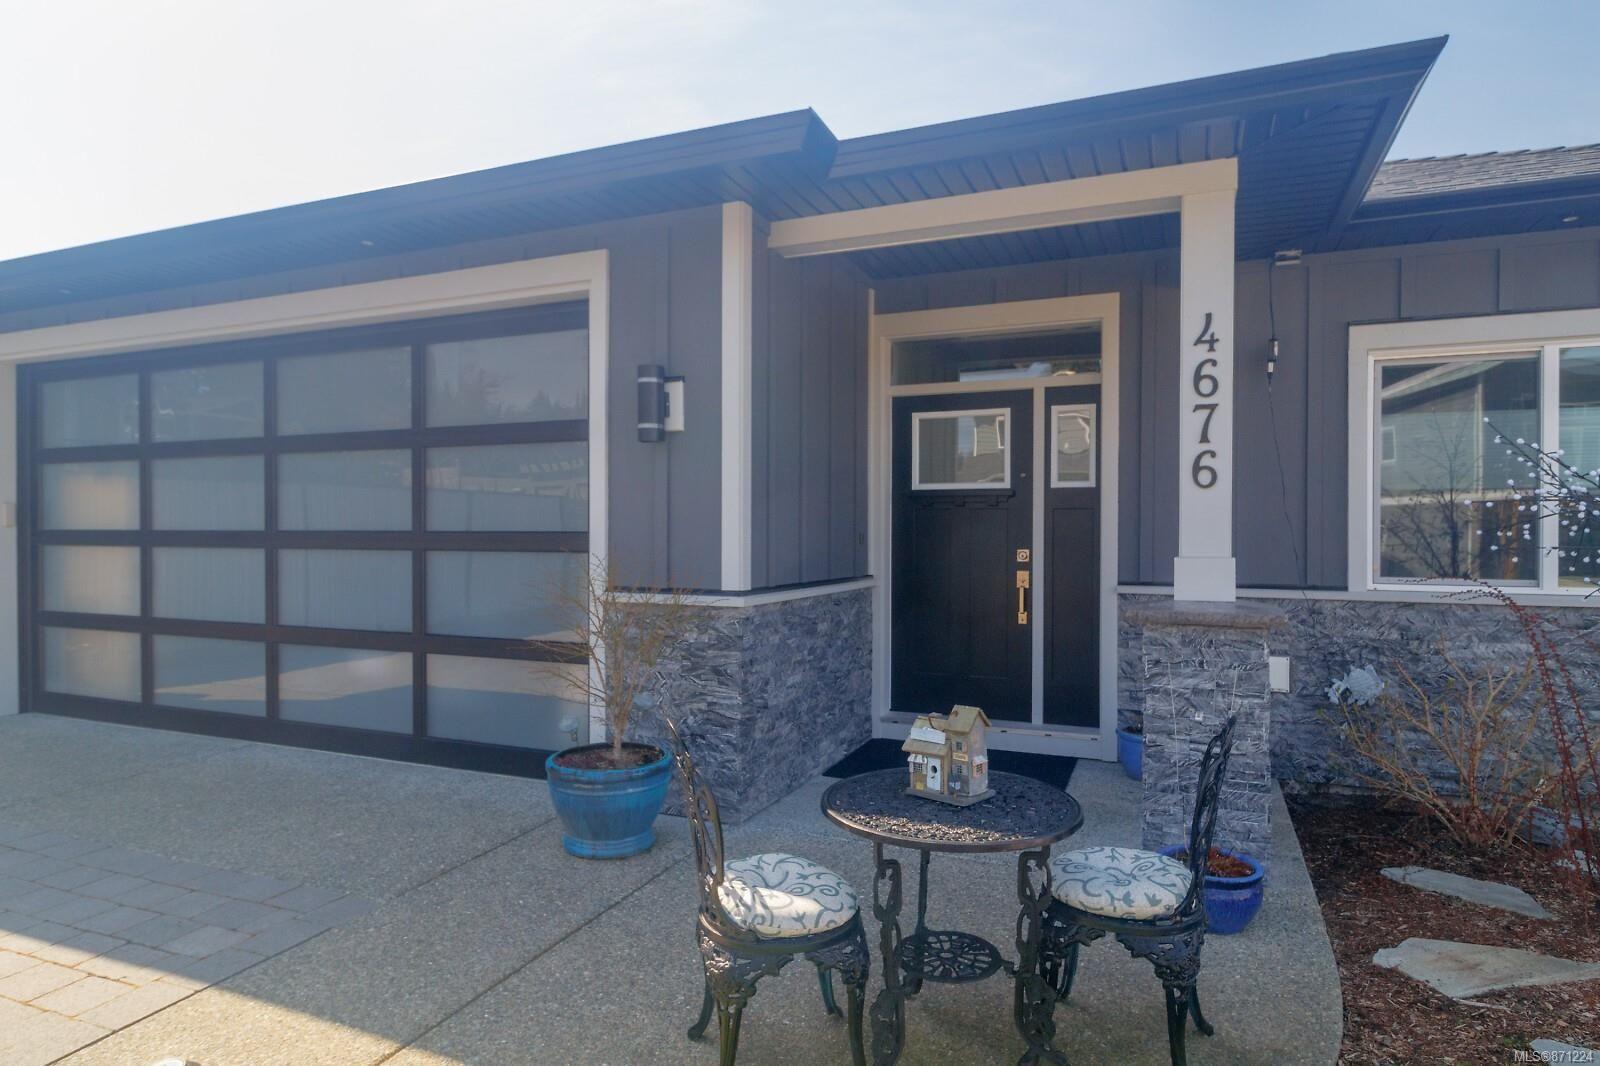 Main Photo: 4676 Caspian Pl in : Du Cowichan Bay House for sale (Duncan)  : MLS®# 871224